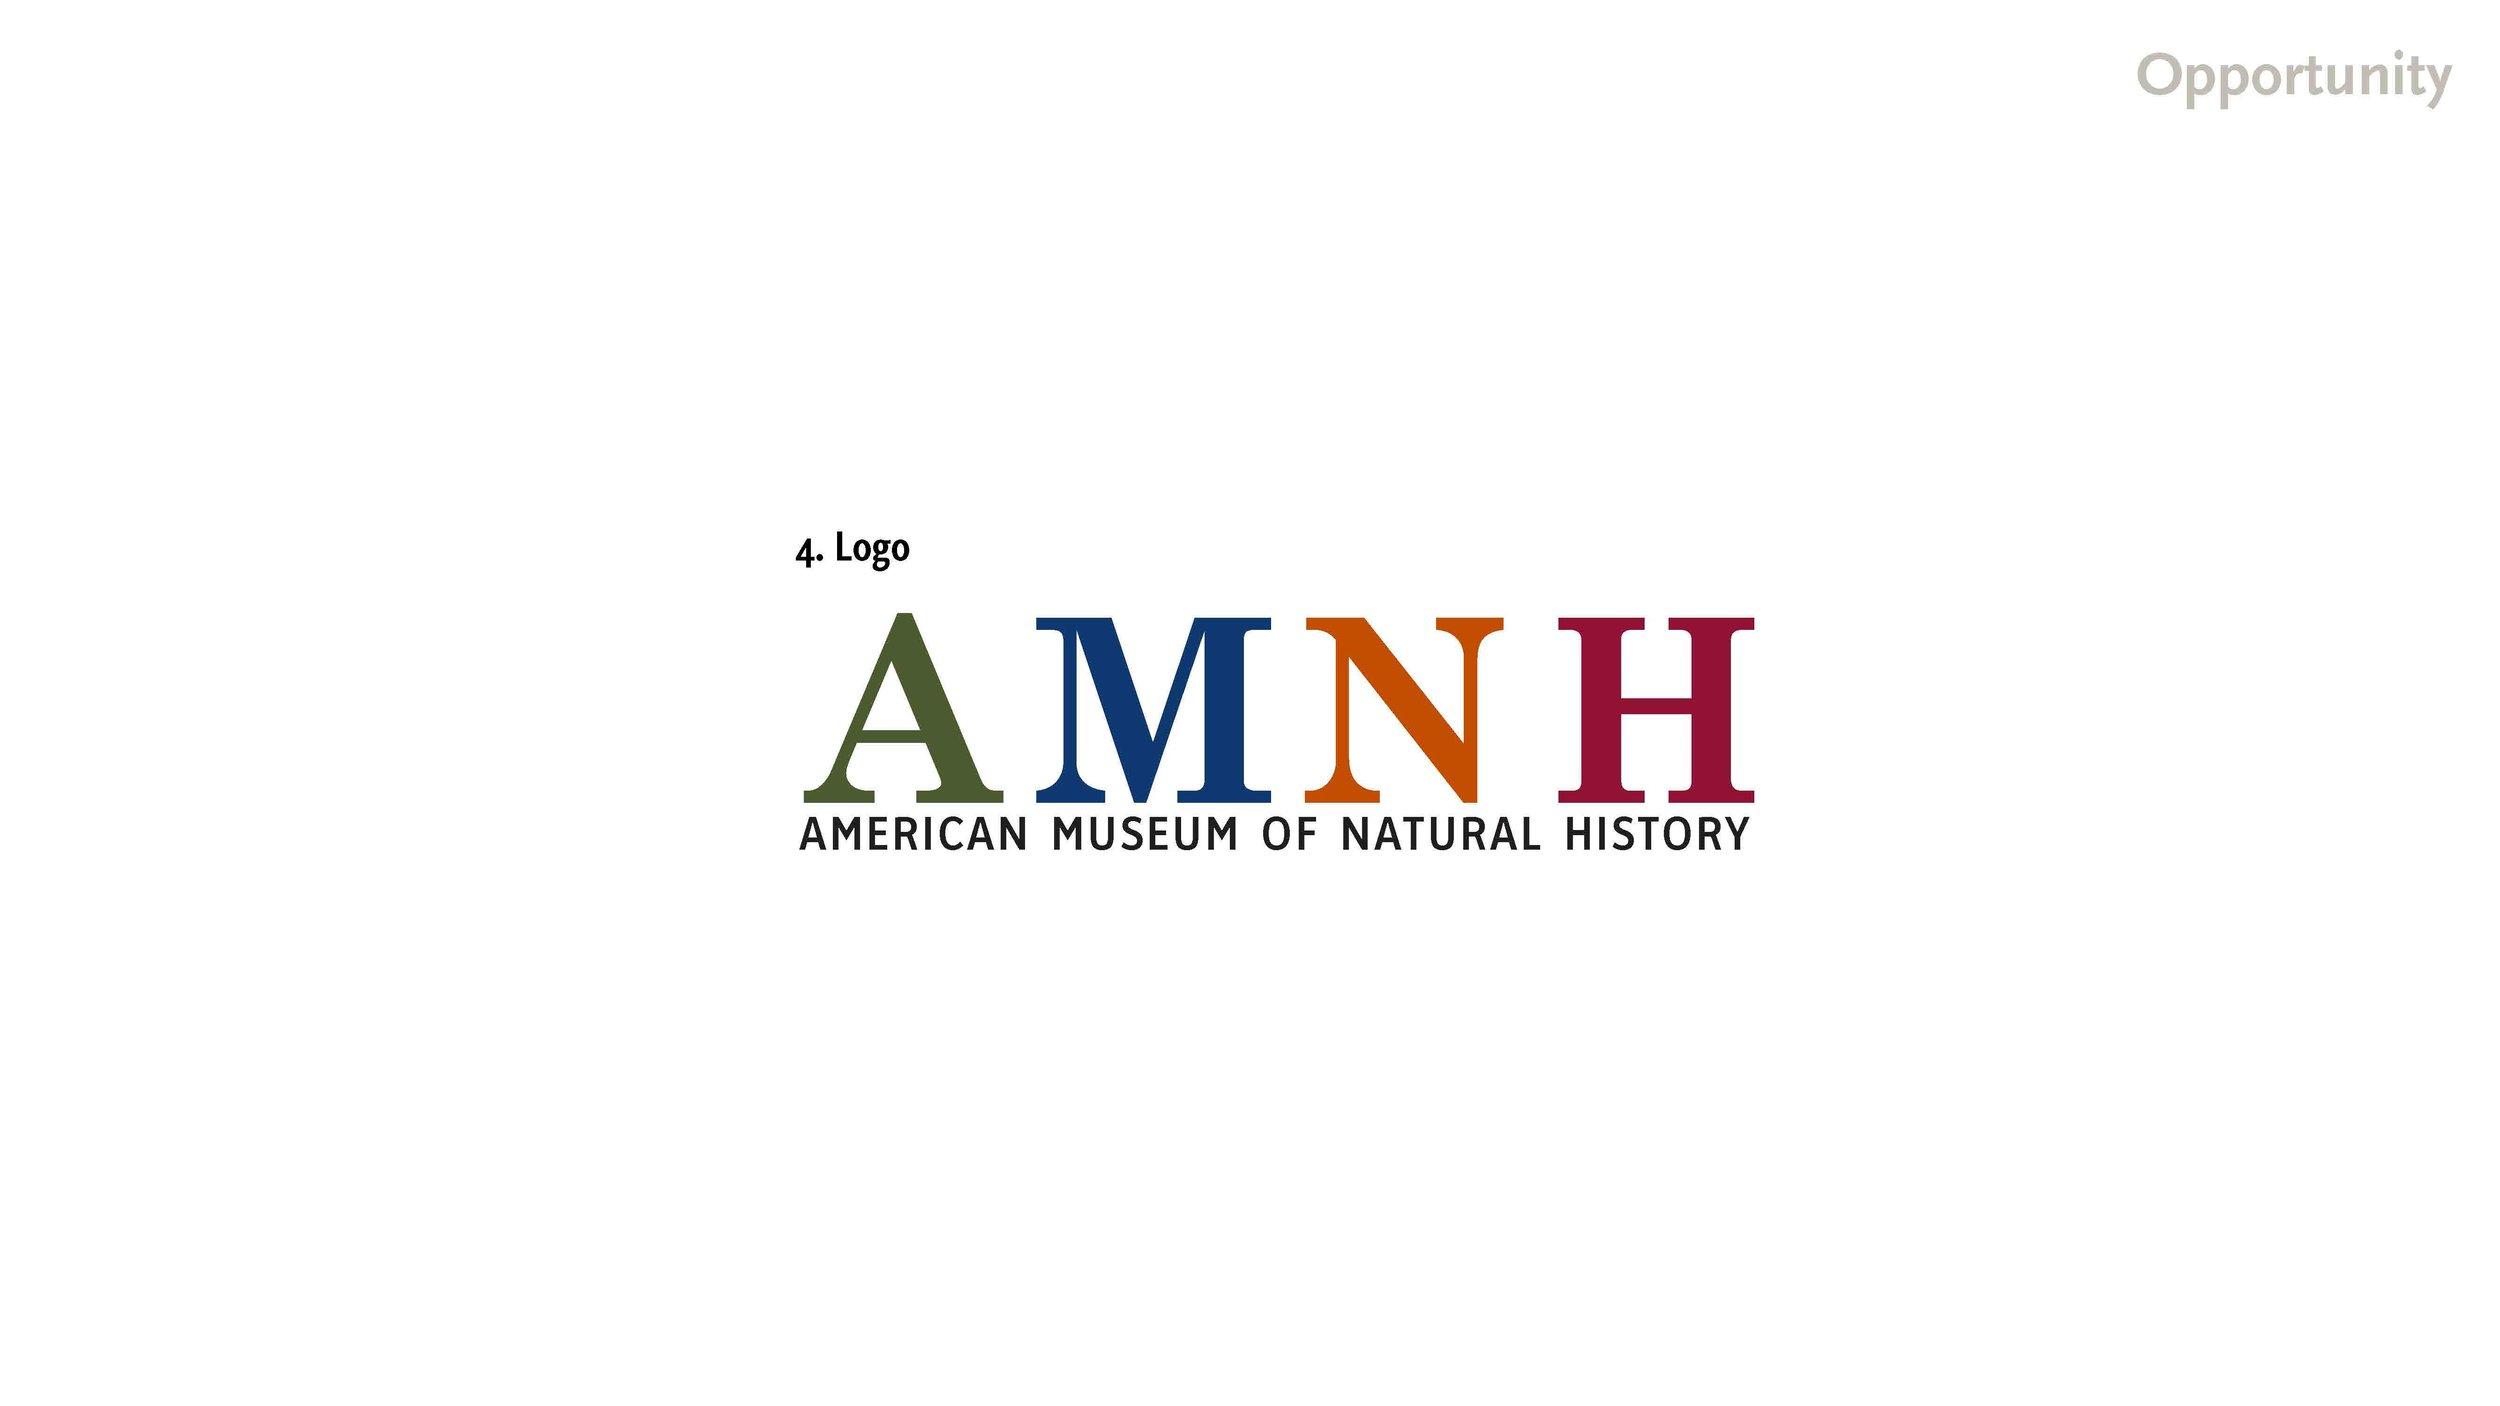 190519 AMNH Final Presentation_Page_38.jpg